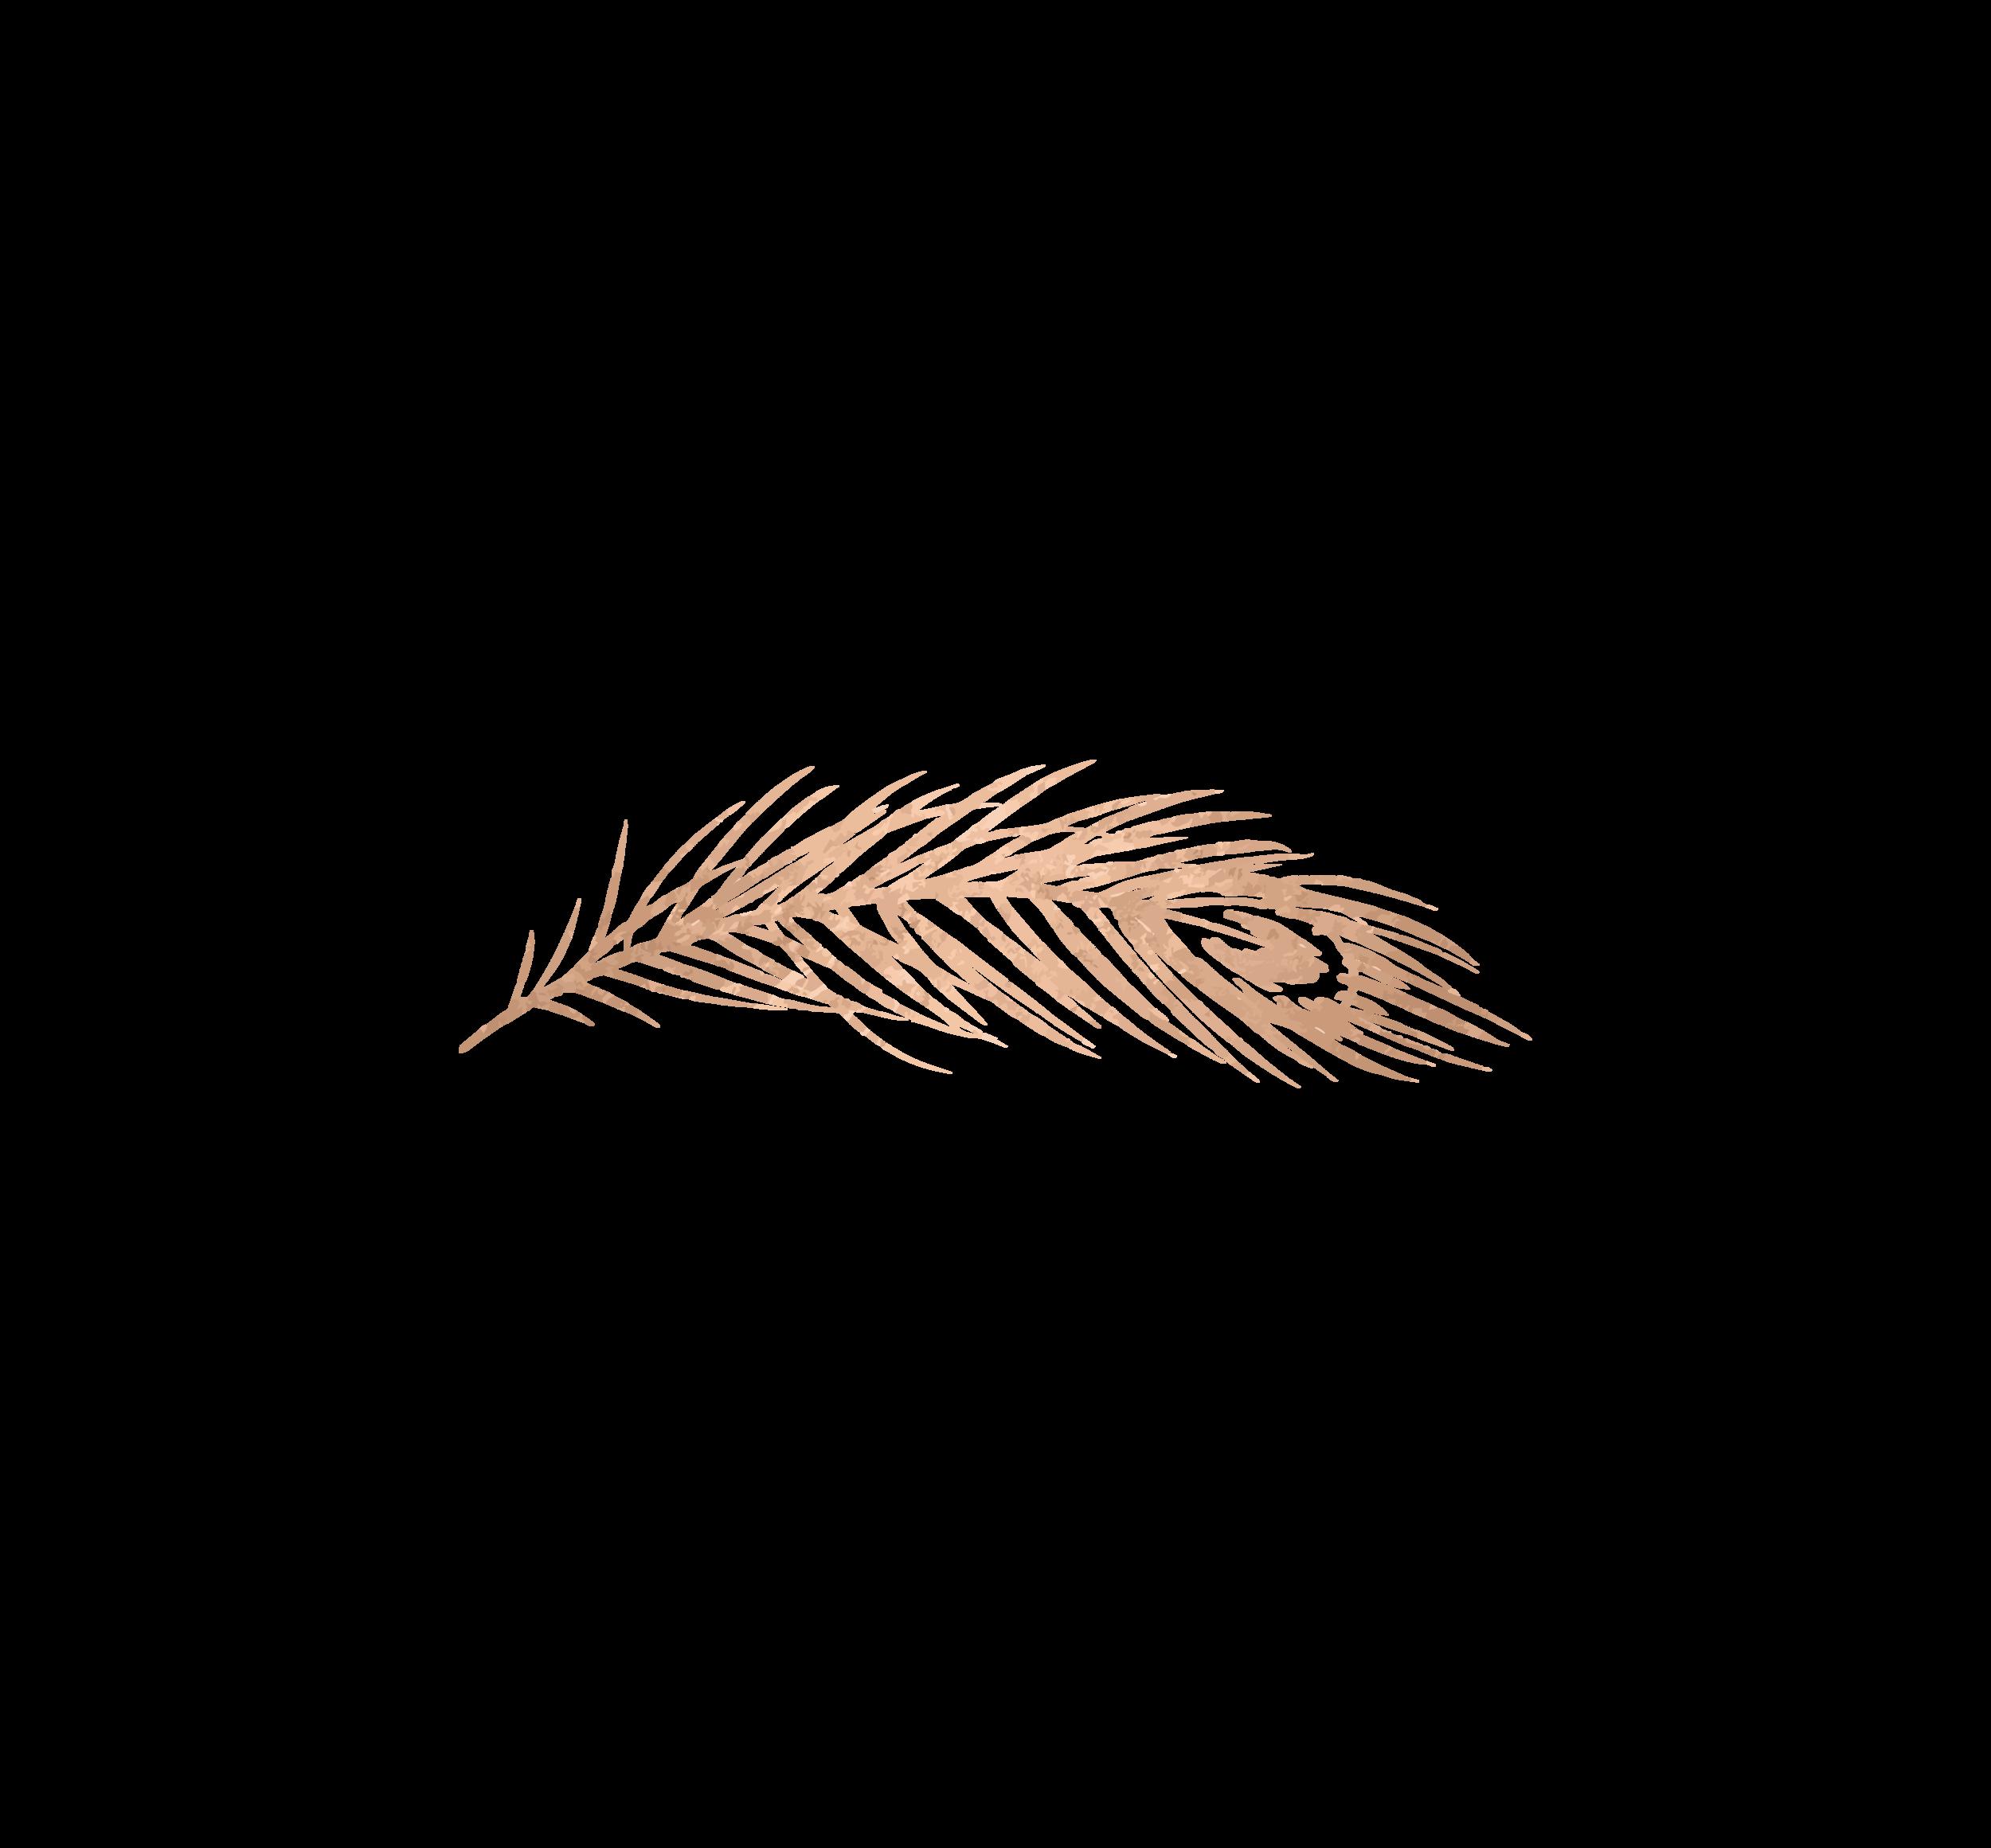 leaf-01.png